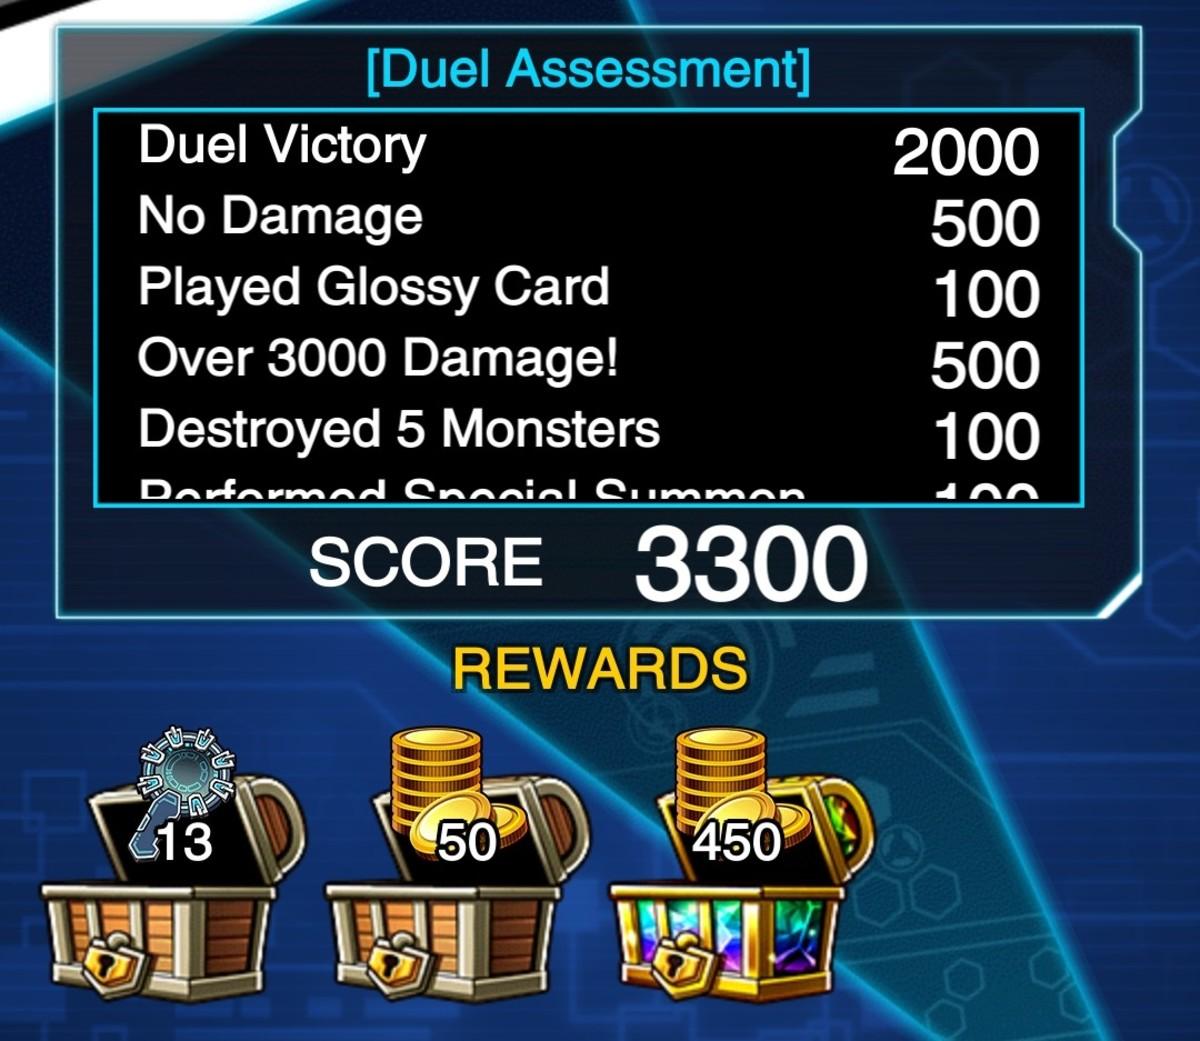 You get one reward drop per 1,000 points.